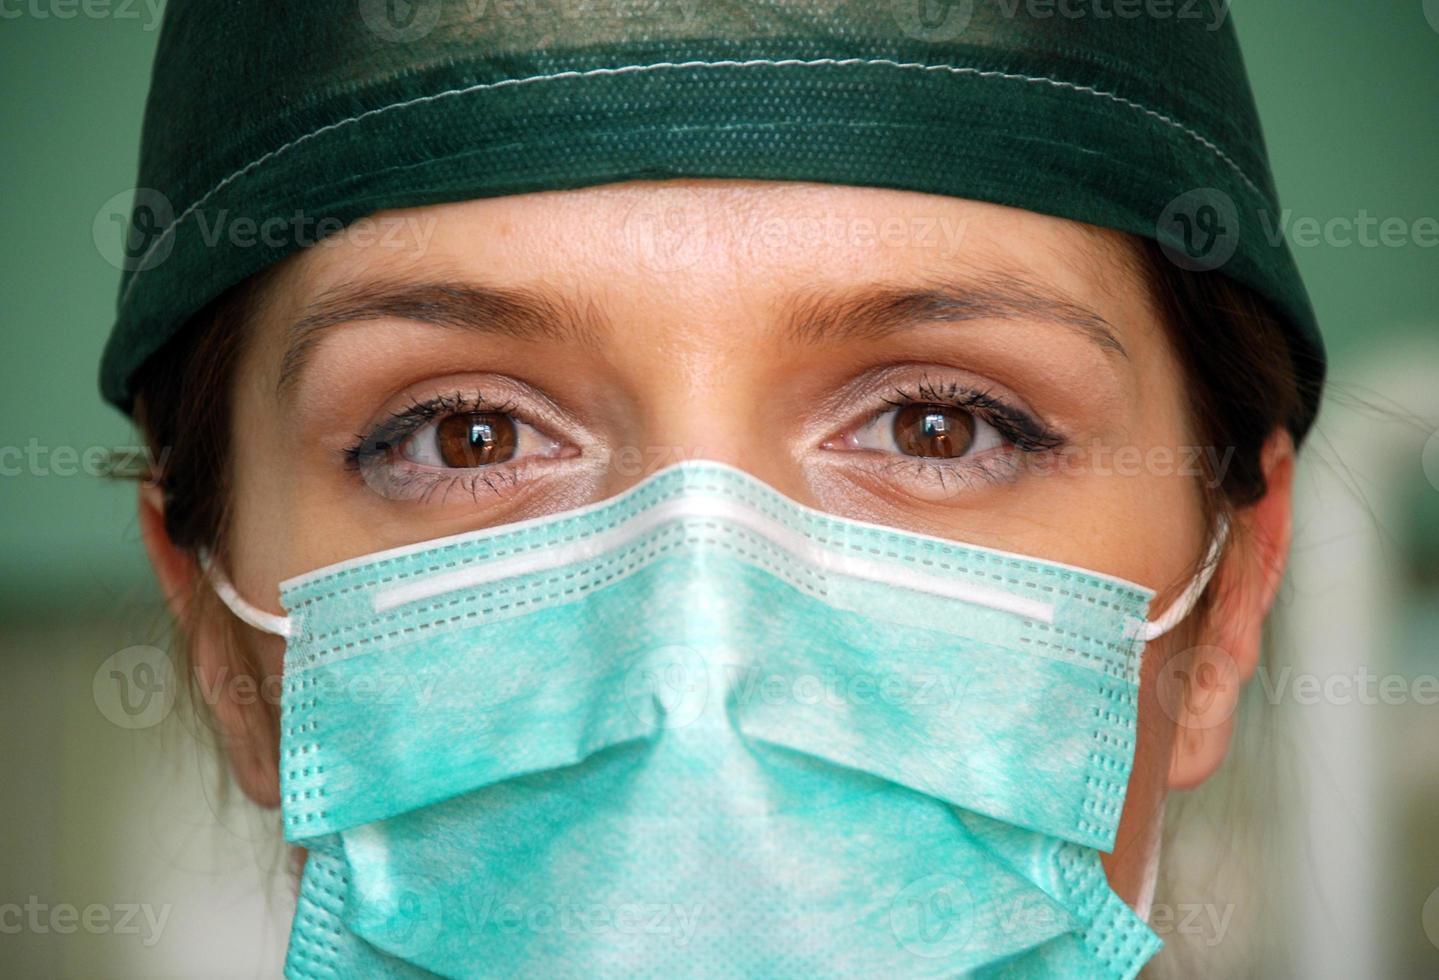 vrouw chirurg close-up foto